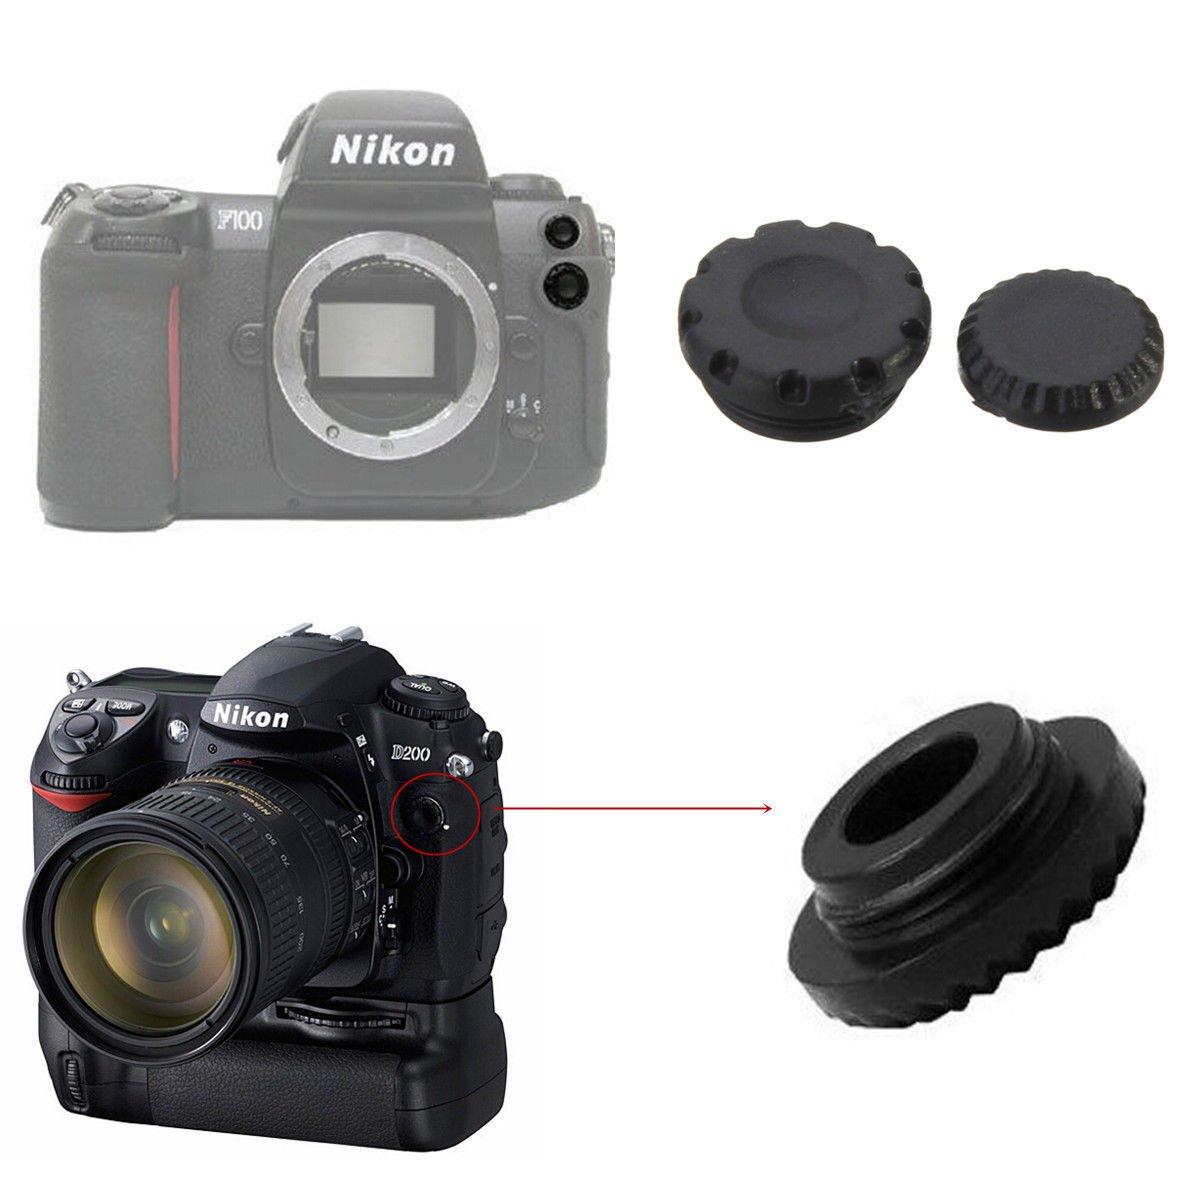 Remote + Flash PC Sync Terminal Cap Cover For Nikon D200 D2X F5 F90X Fuji S3 S5          VW2